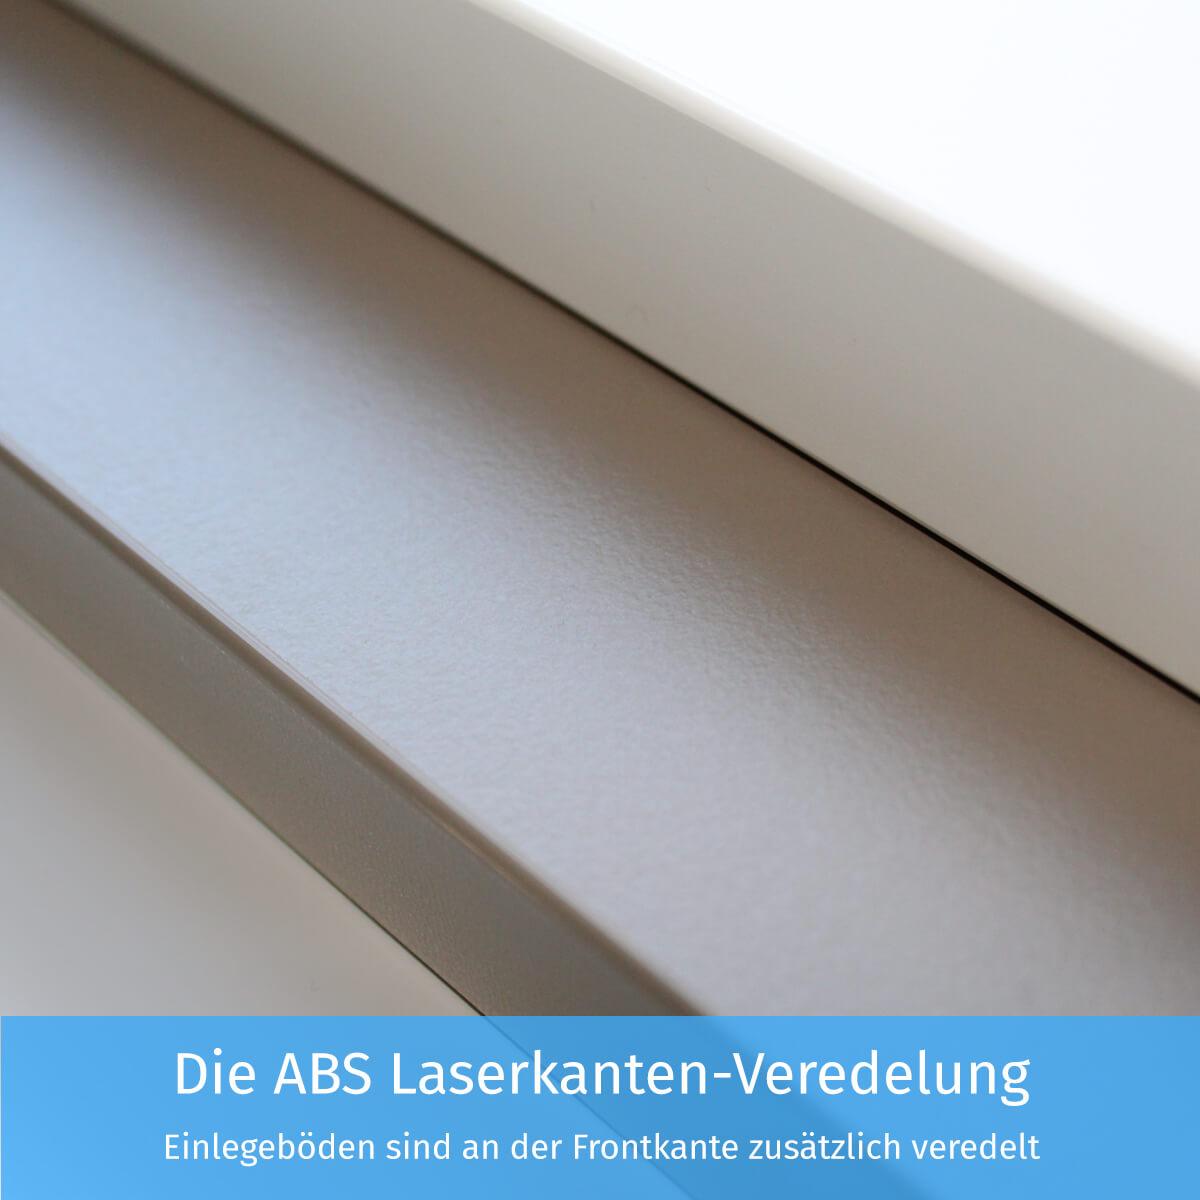 Die ABS Laserkanten-Veredelung